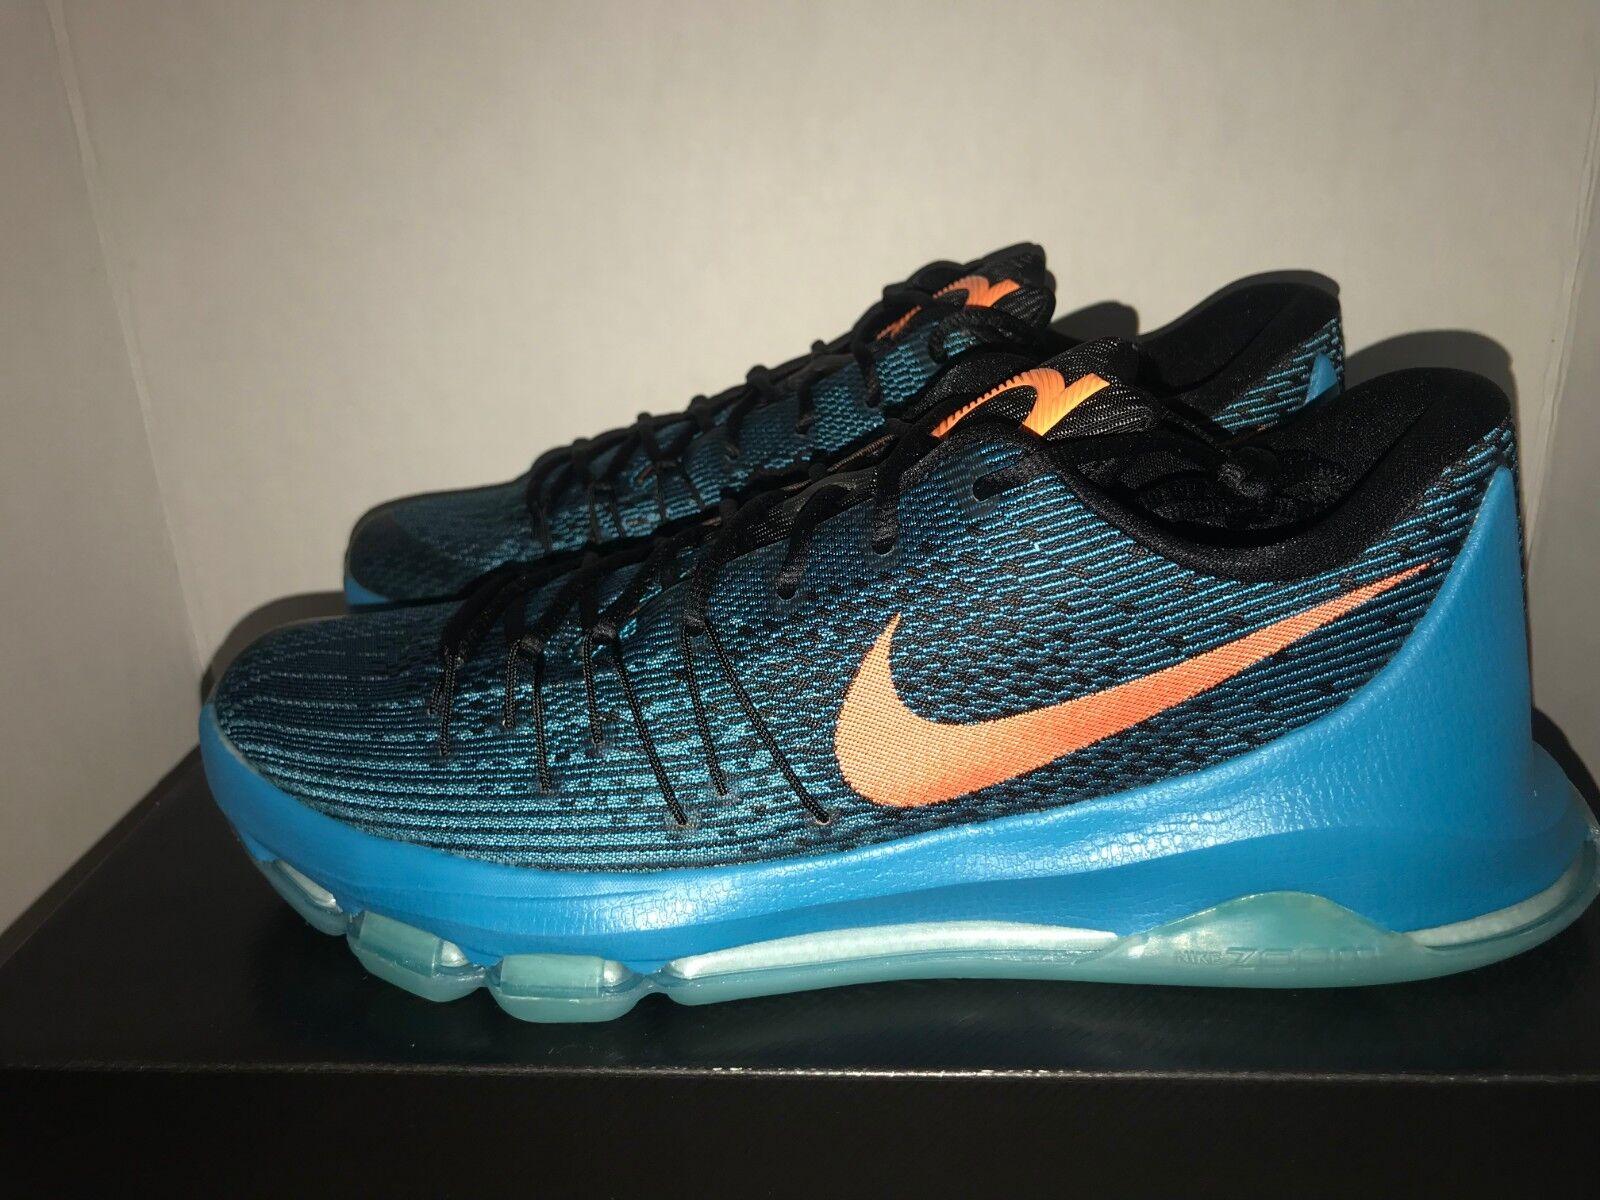 Nike kevin durant kd viii